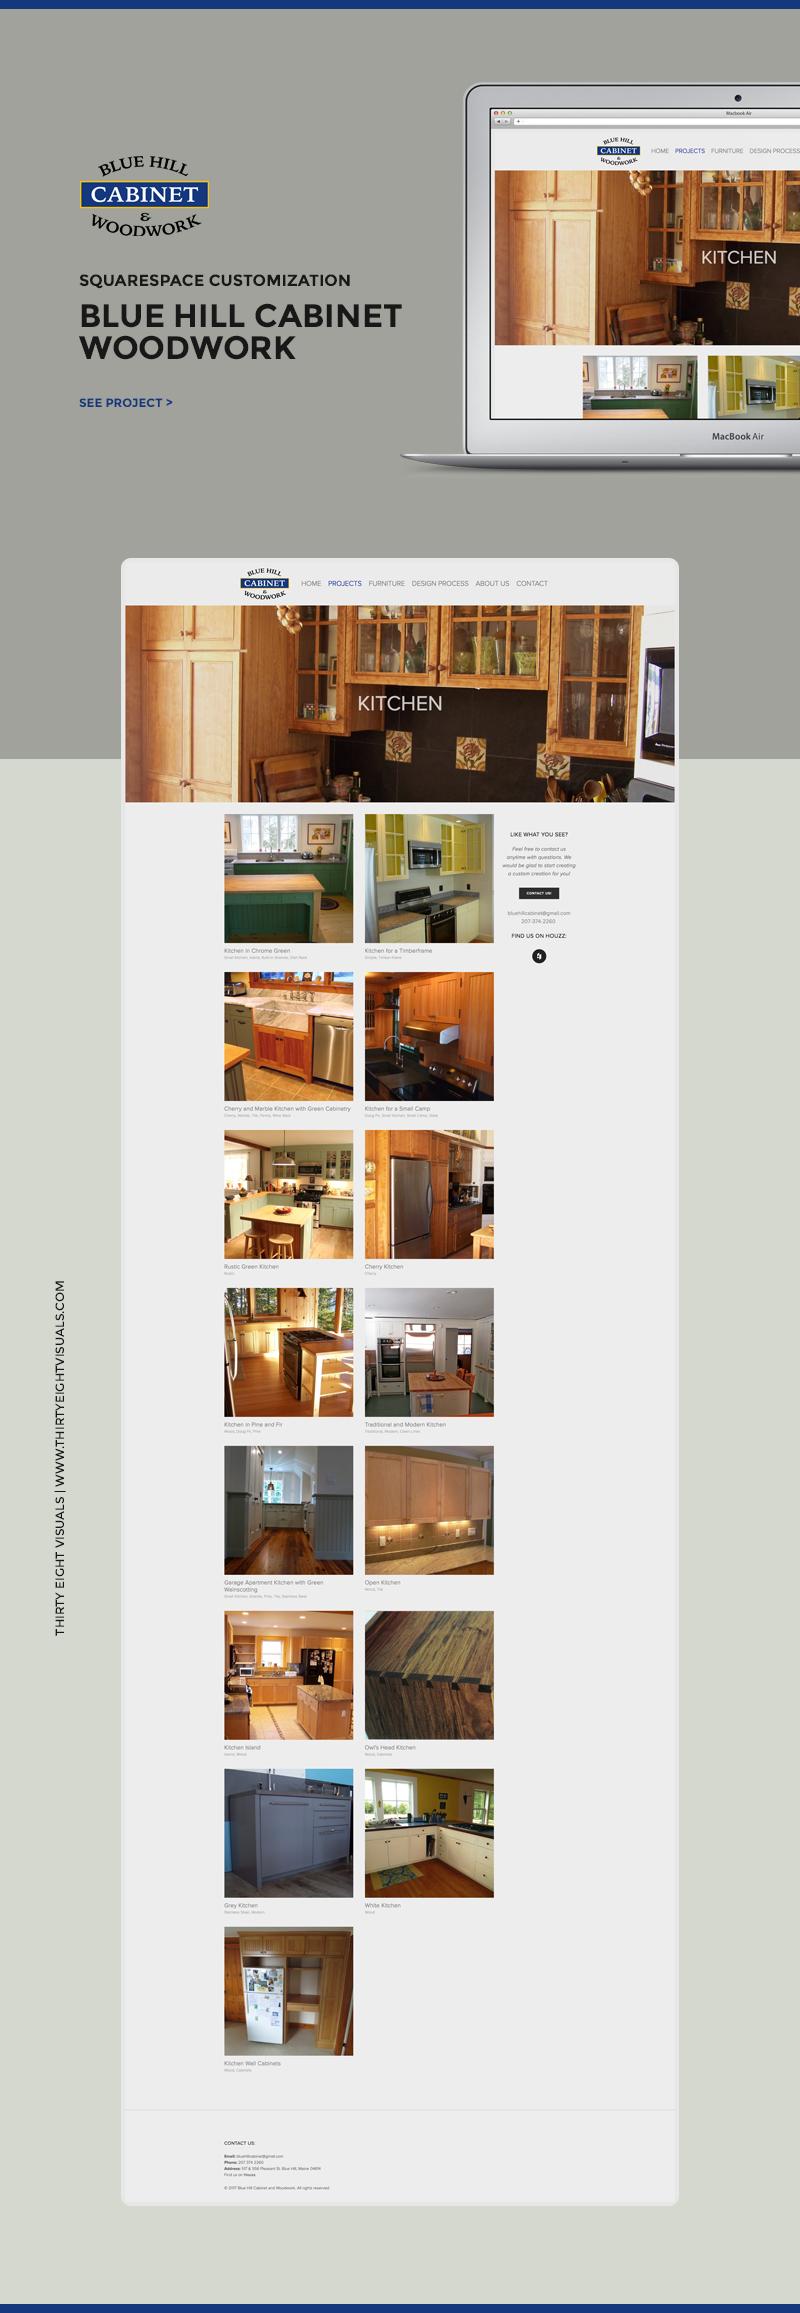 Blue Hill Cabinet Squarespace customization.jpg